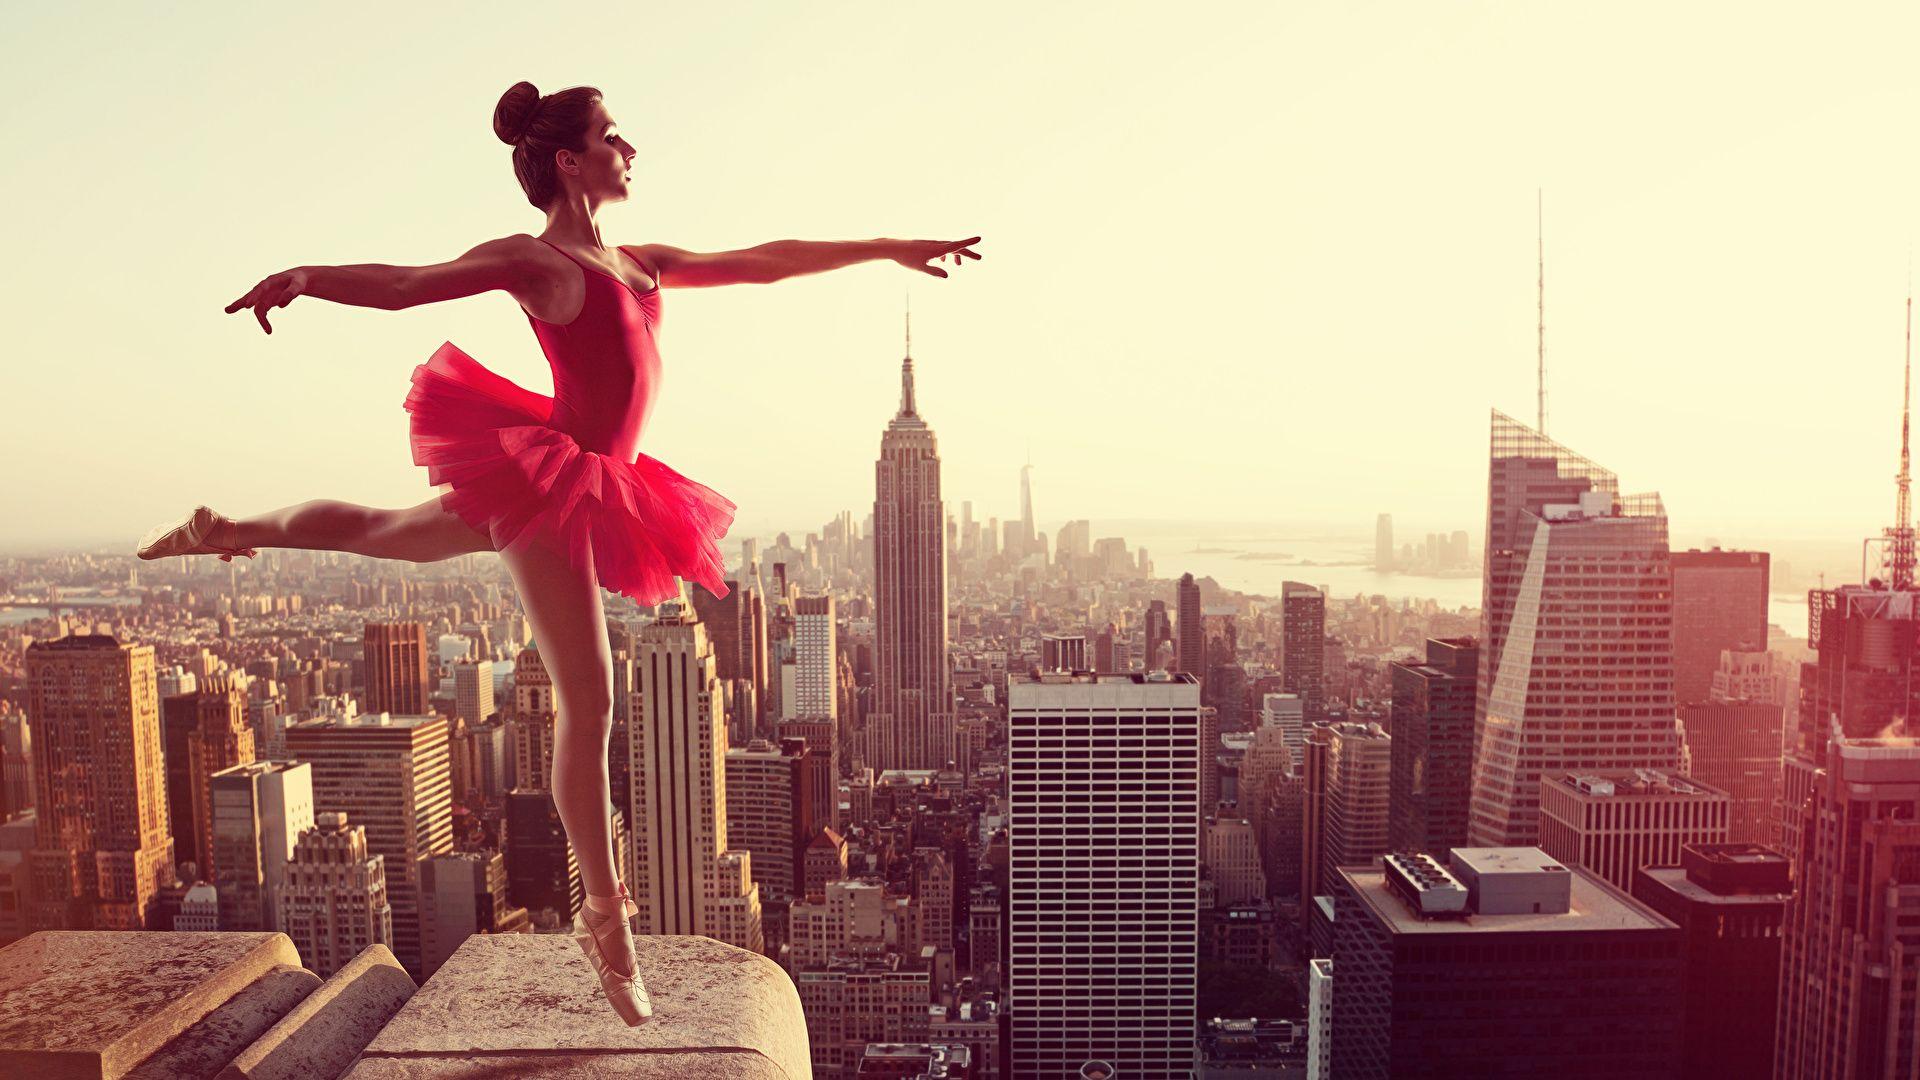 Dance Wallpaper Image